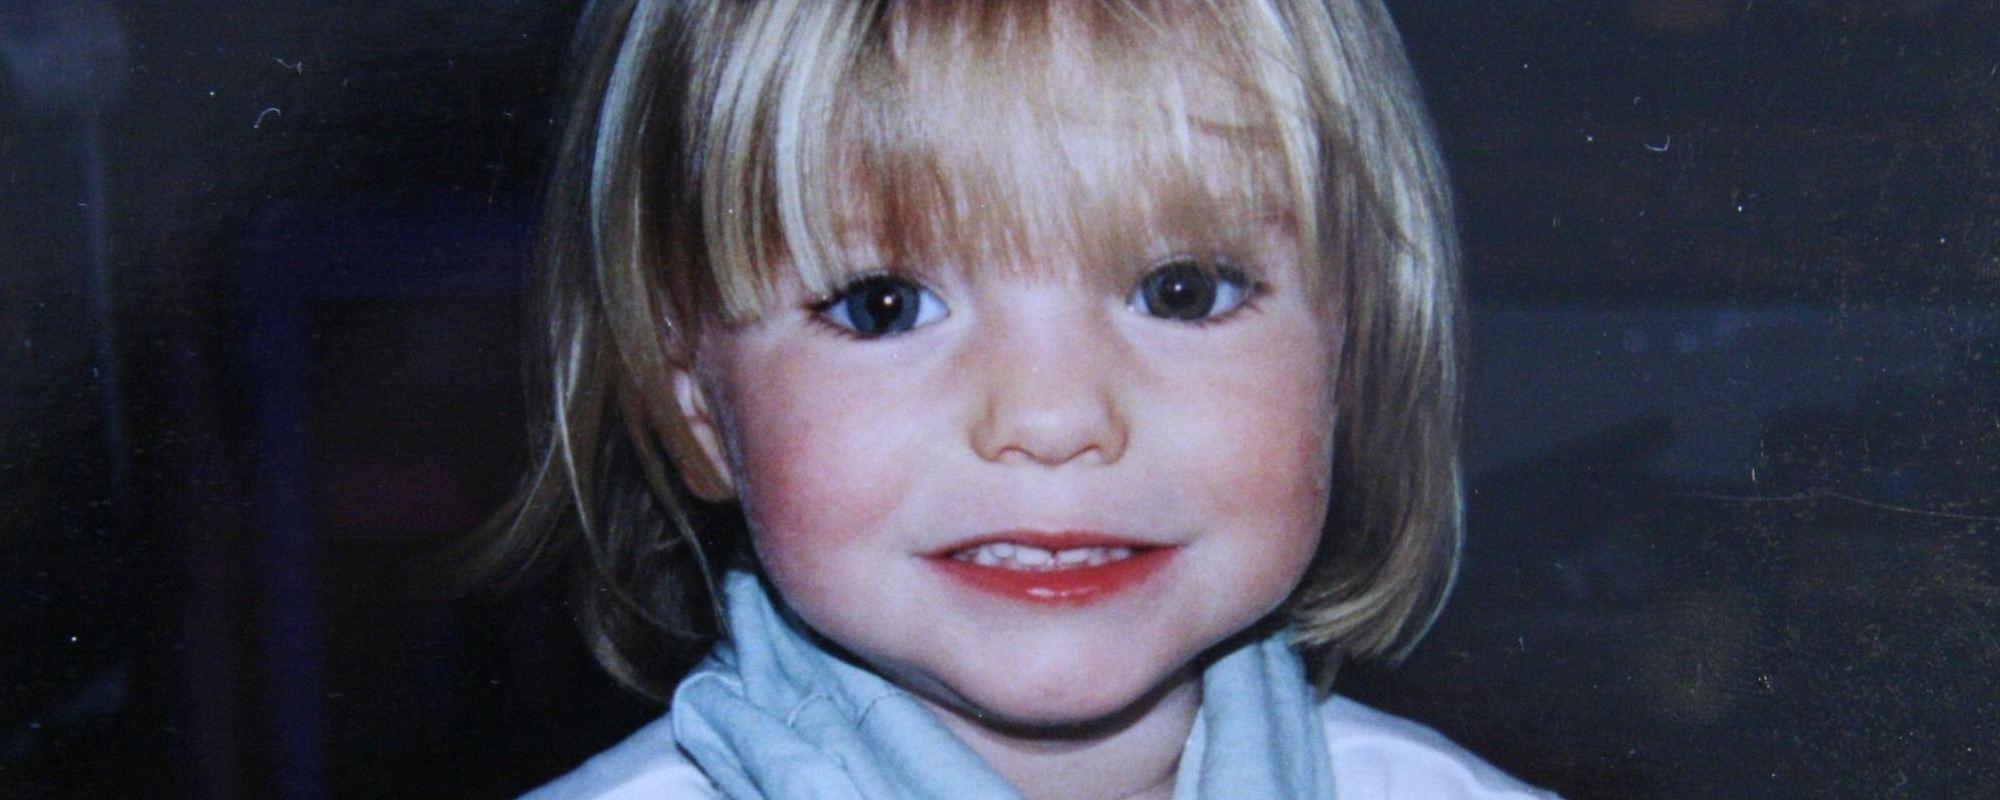 Madeleine McCann Family Handout